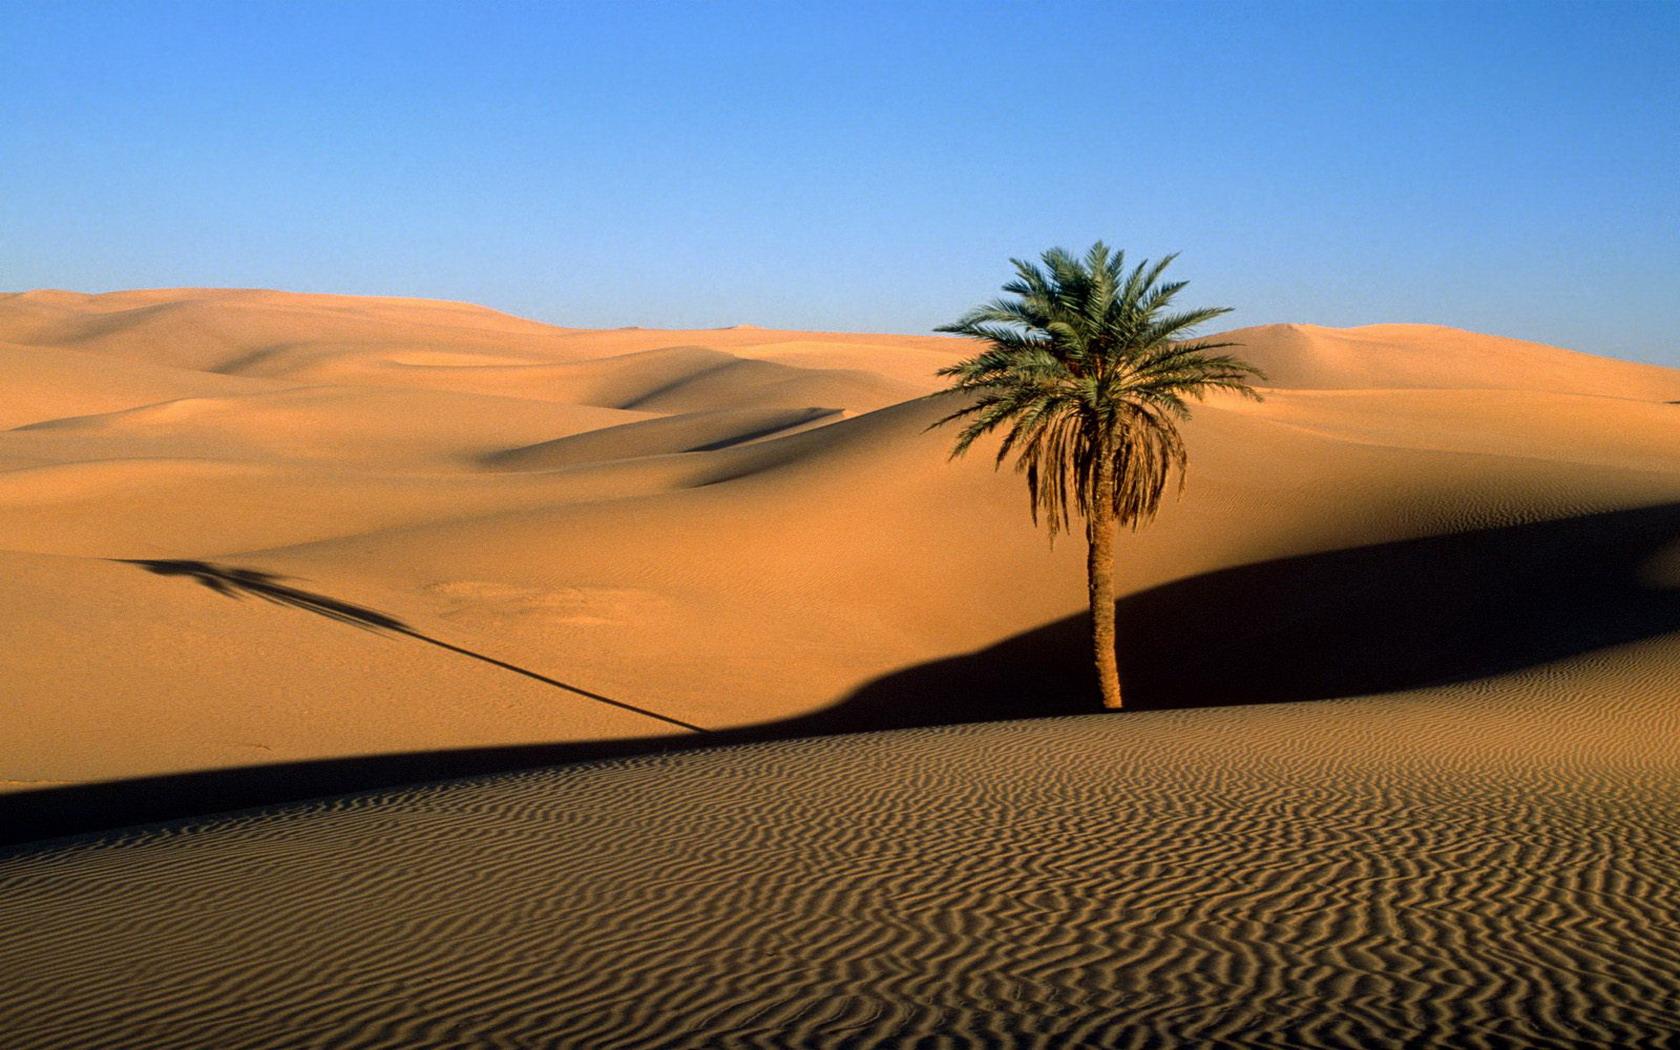 Desert biome presentation on emaze